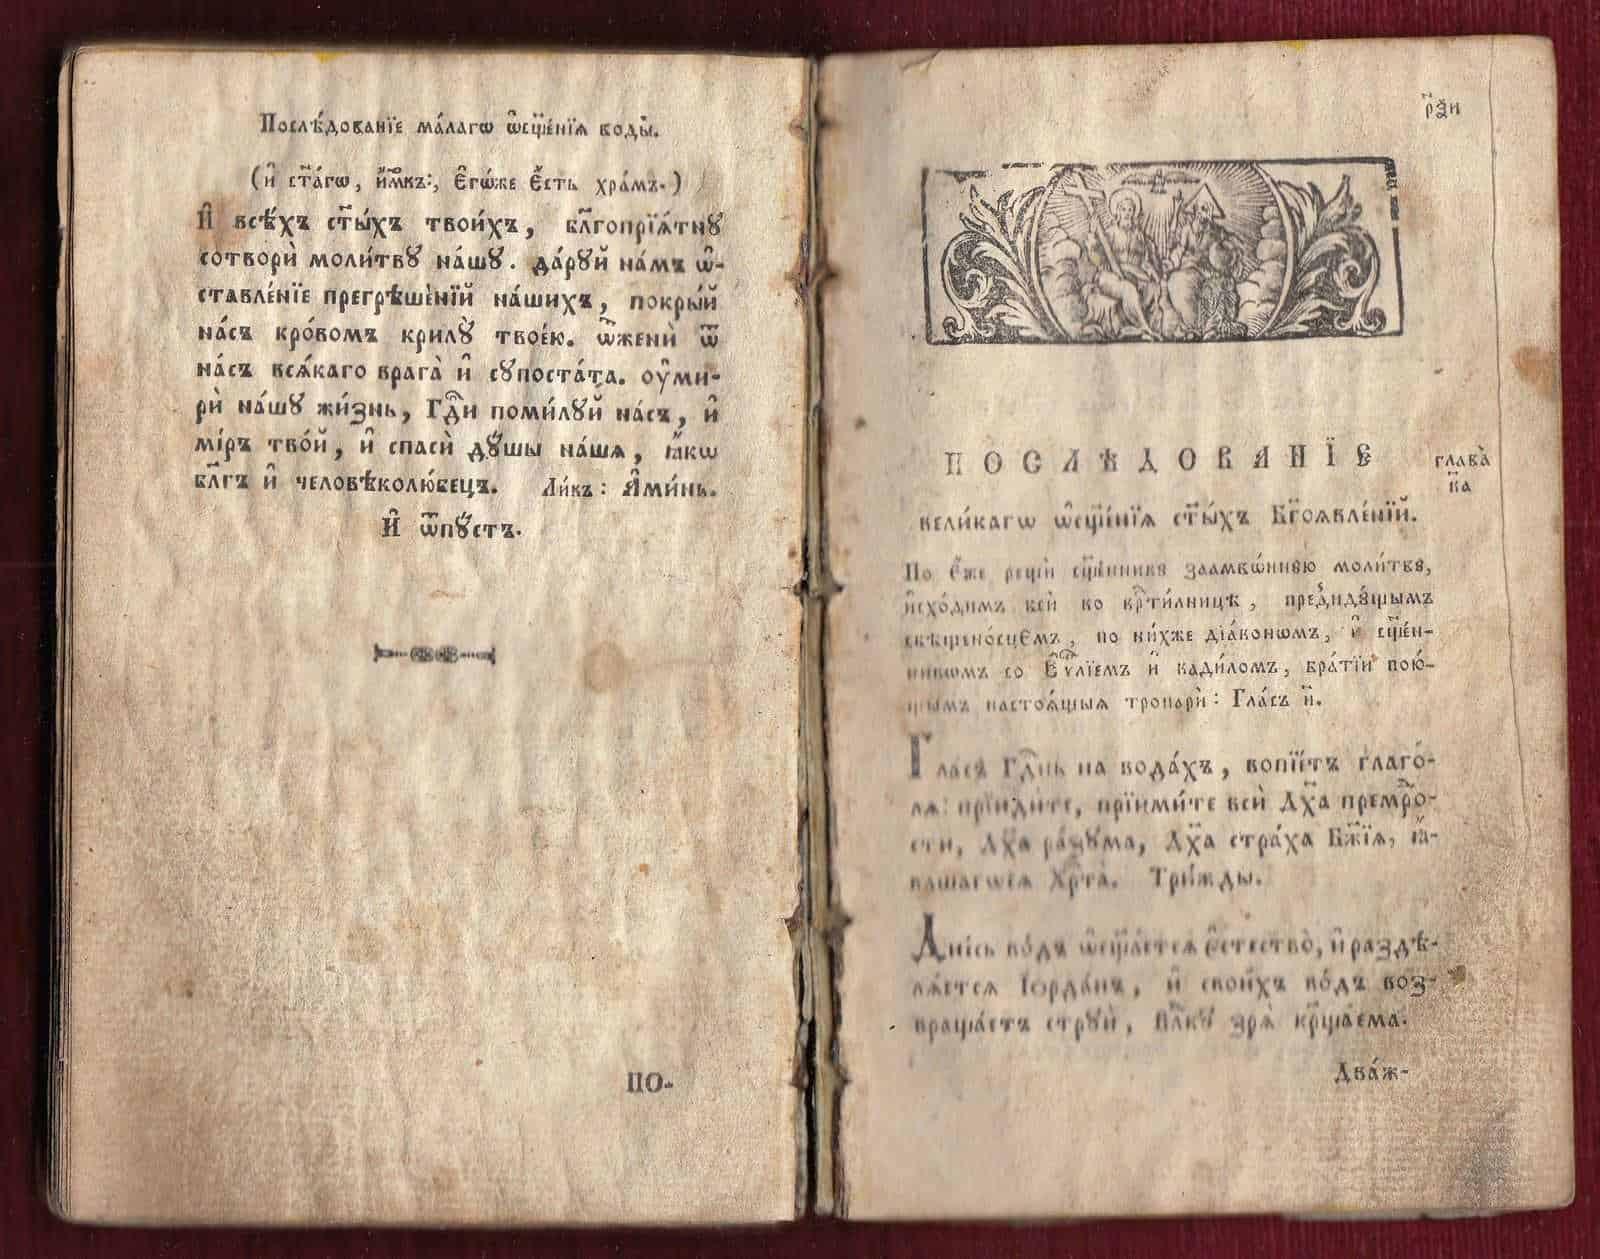 19c-Posledovanie-Acolouthia-e-Old-Slavonic-Inscribed-Manuscript-401146479031-9